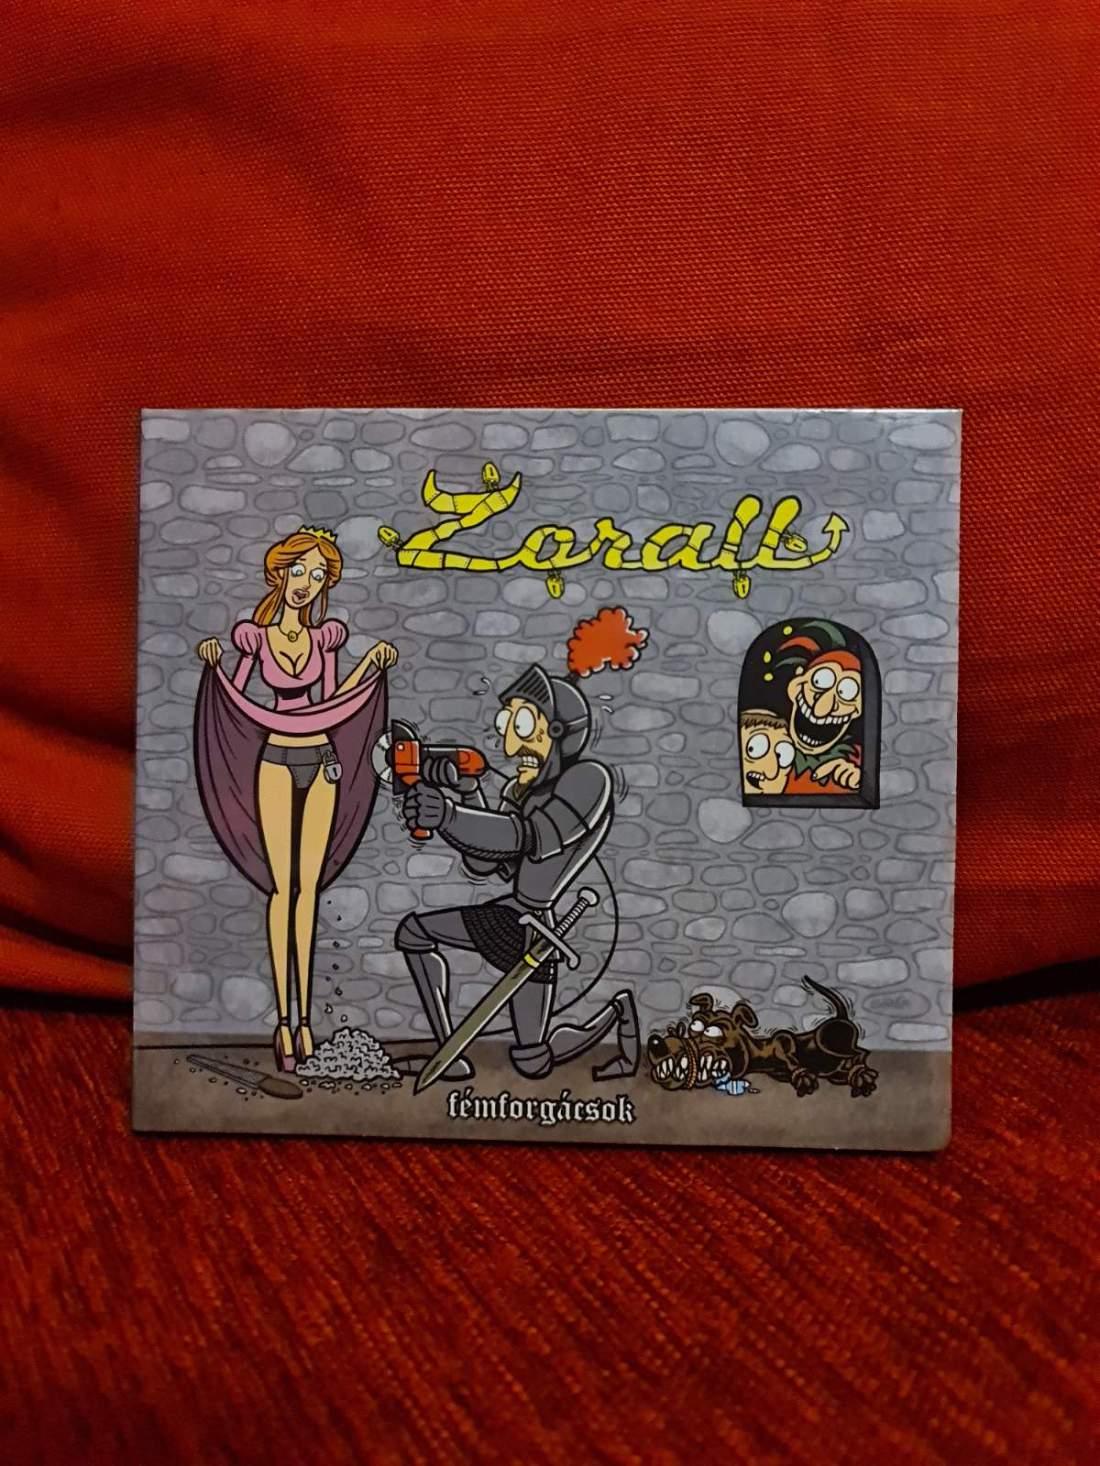 ZORALL - FÉMFORGÁCSOK CD